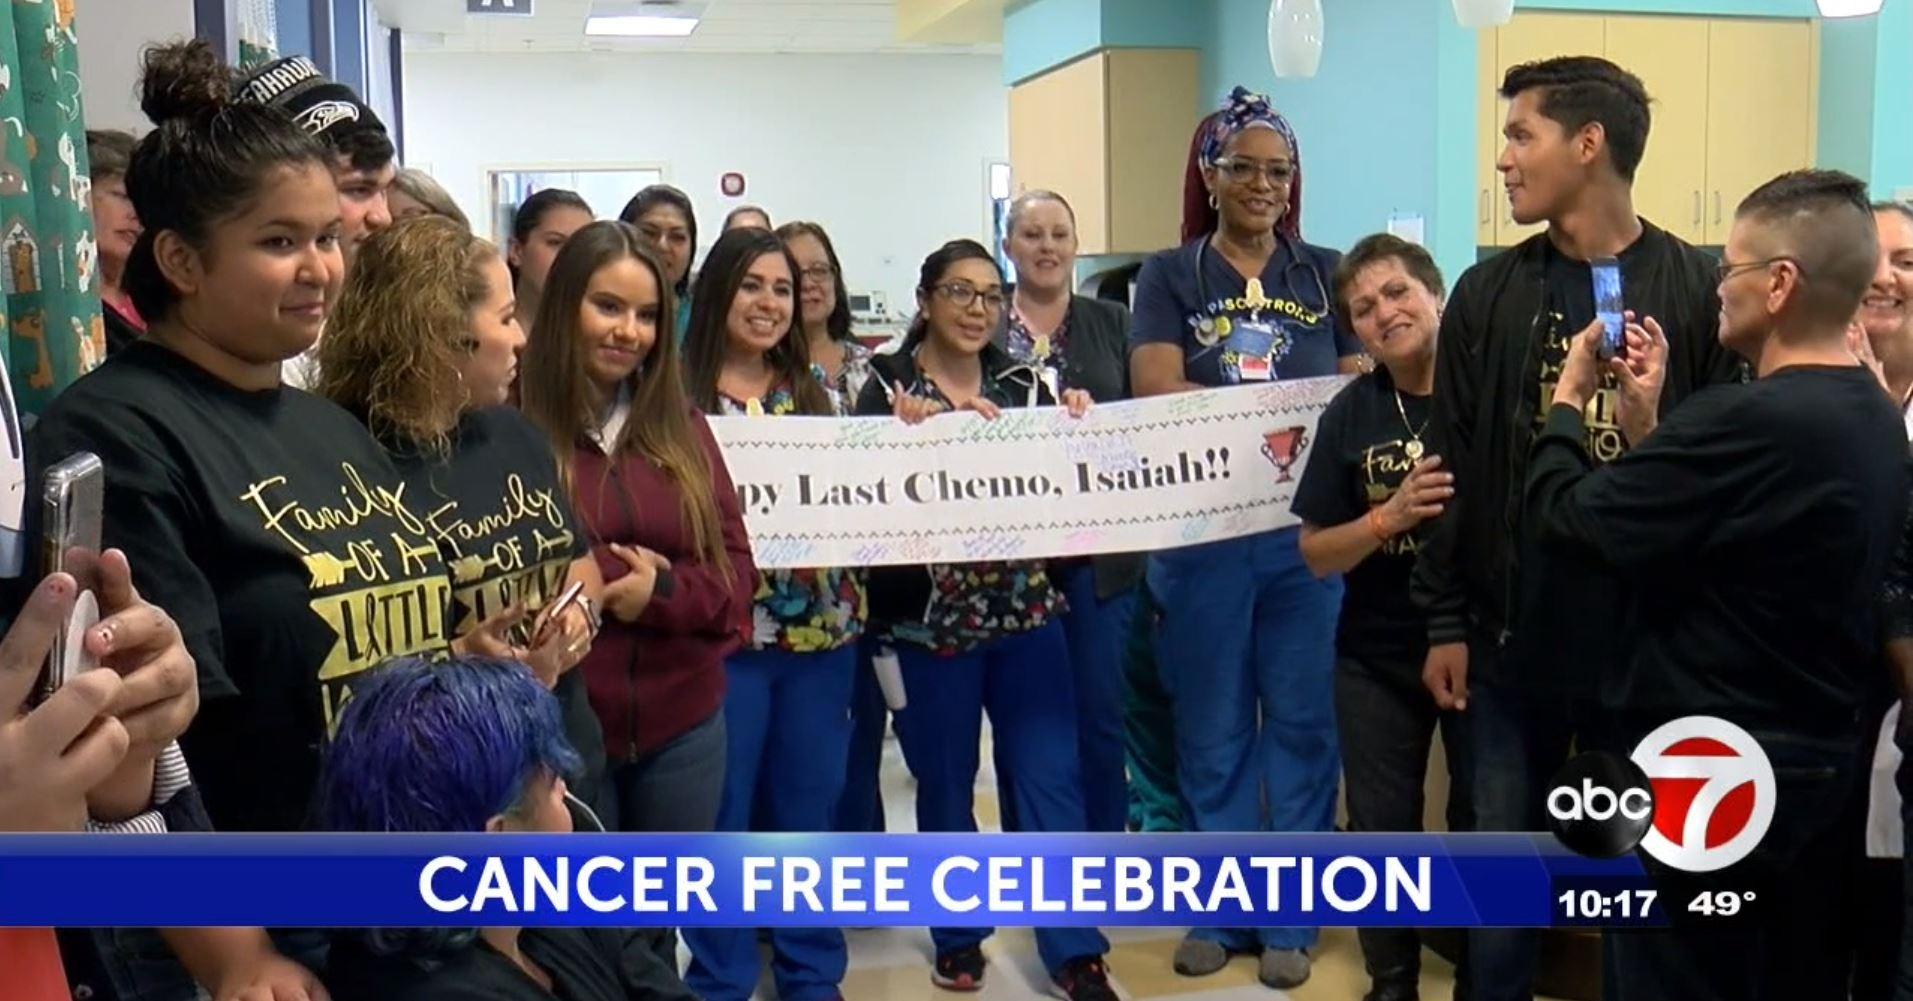 isaiah hernando cancer free